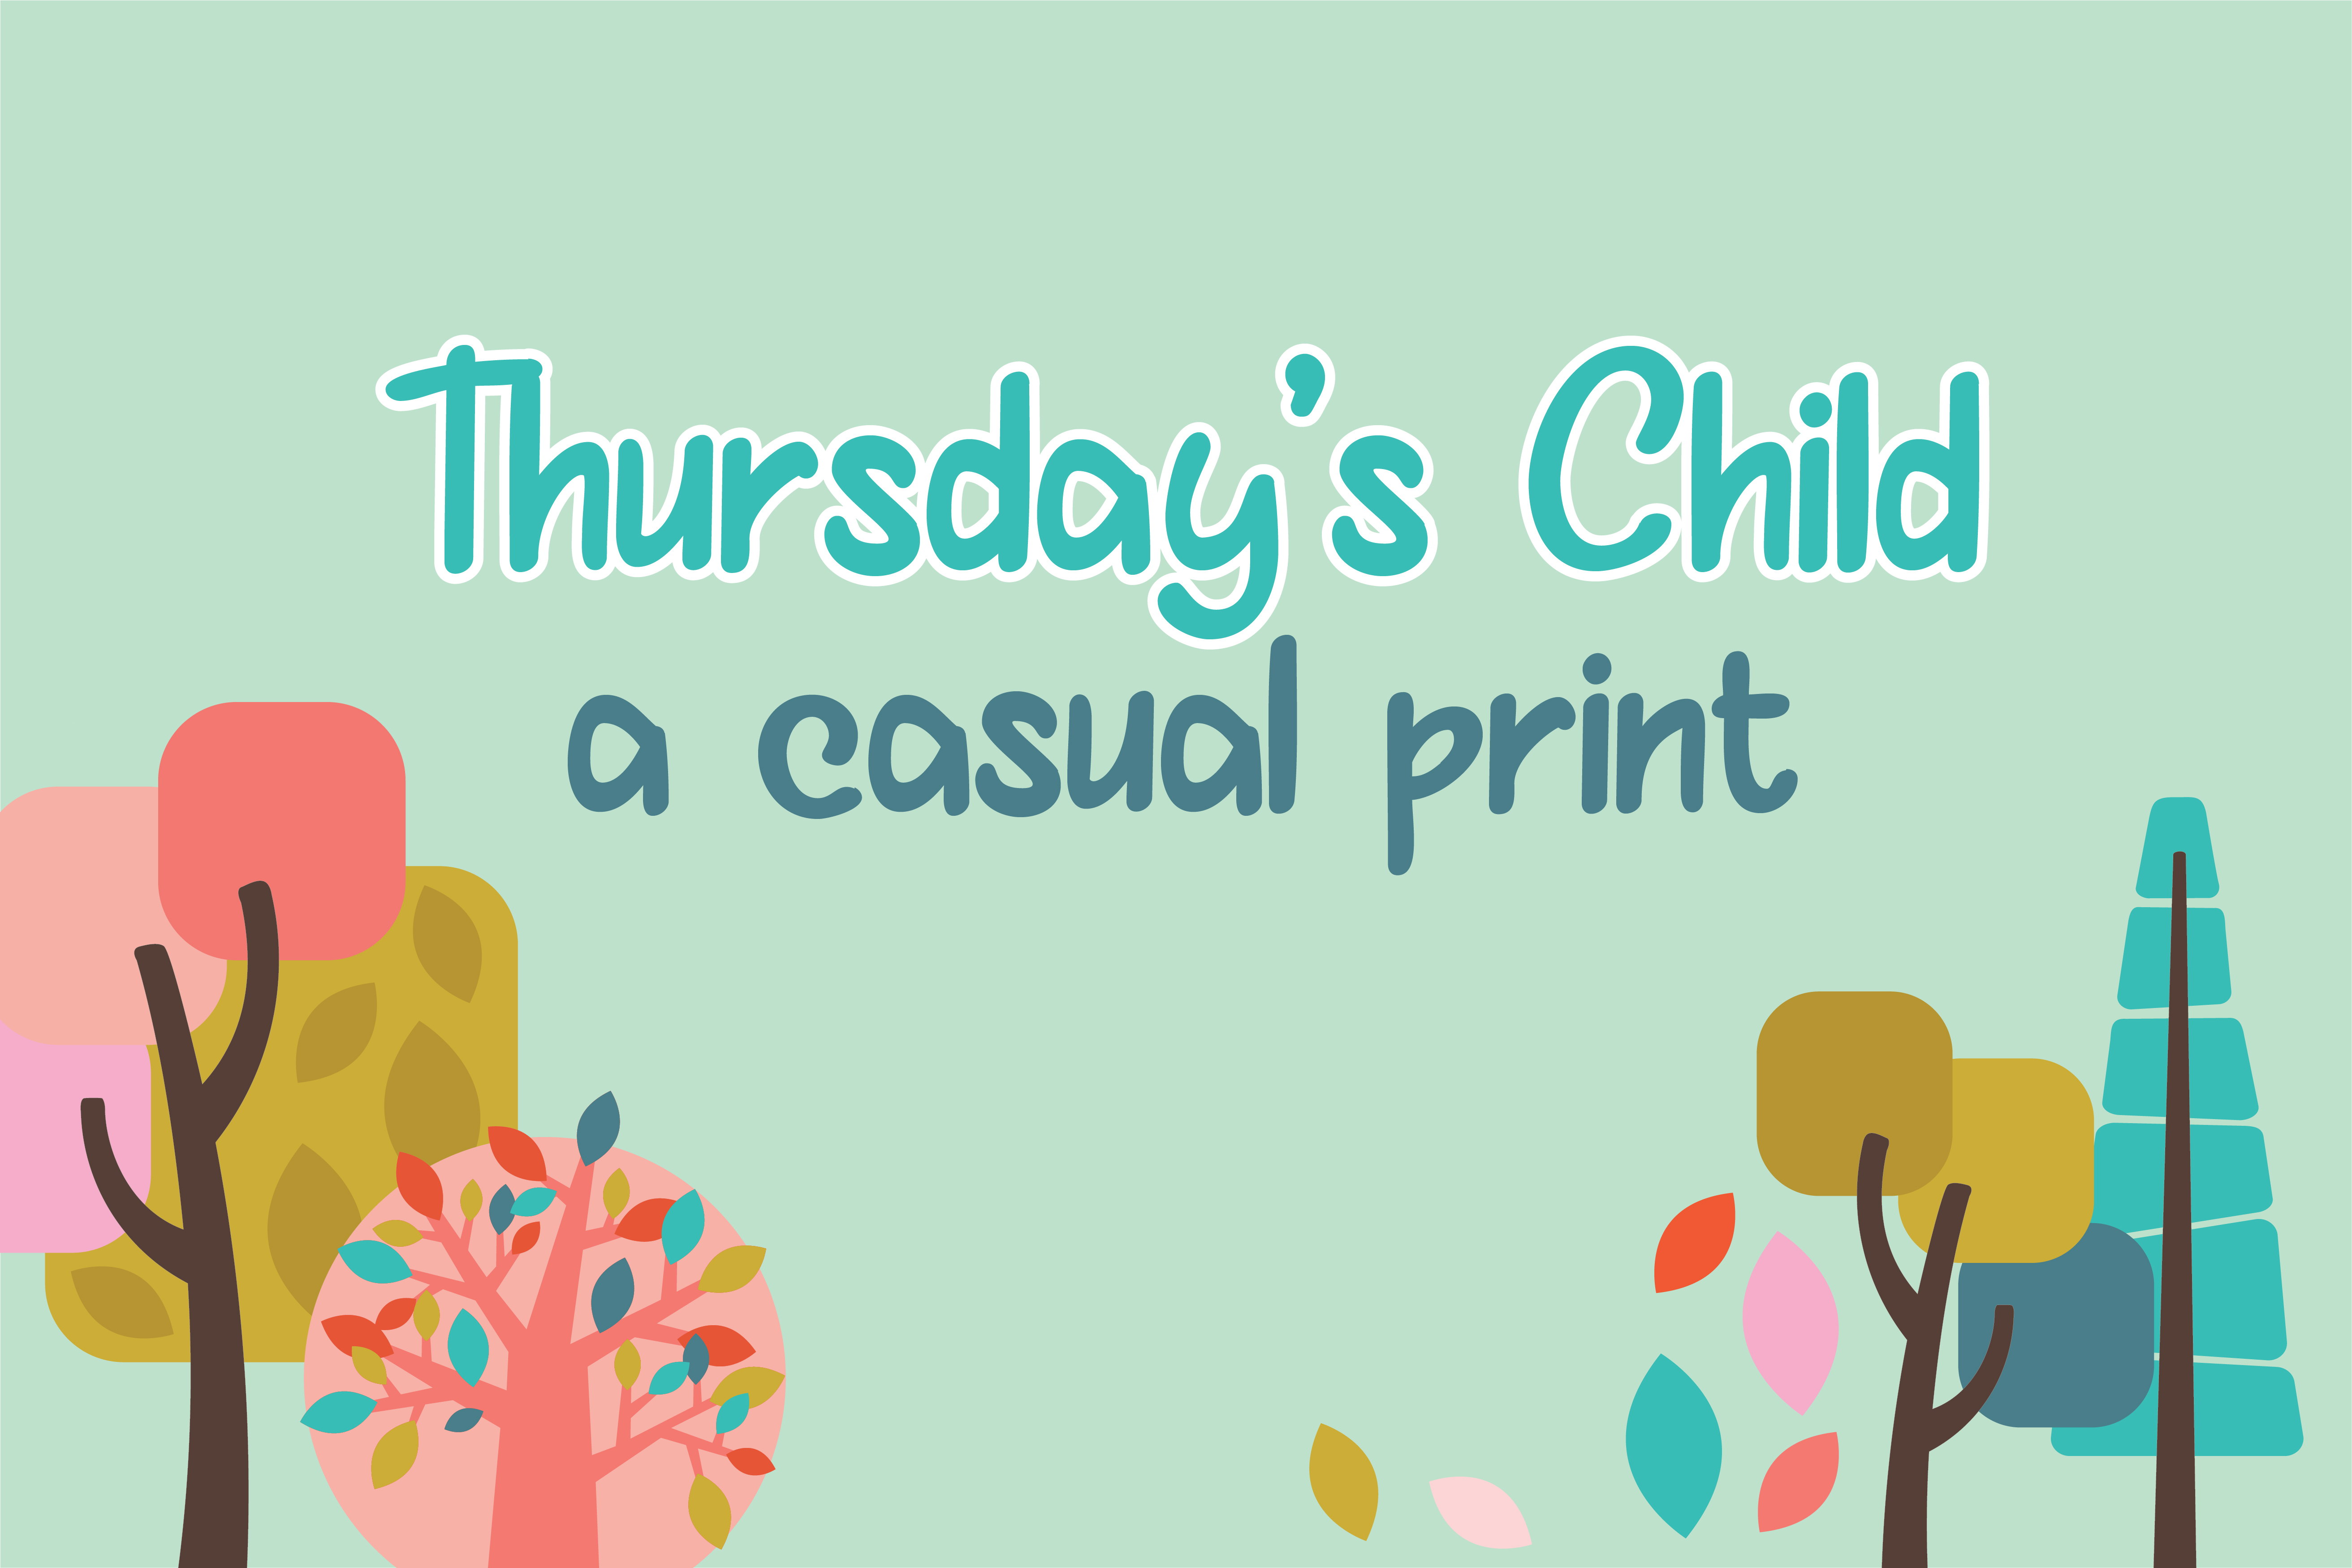 PN Thursday's Child example image 1